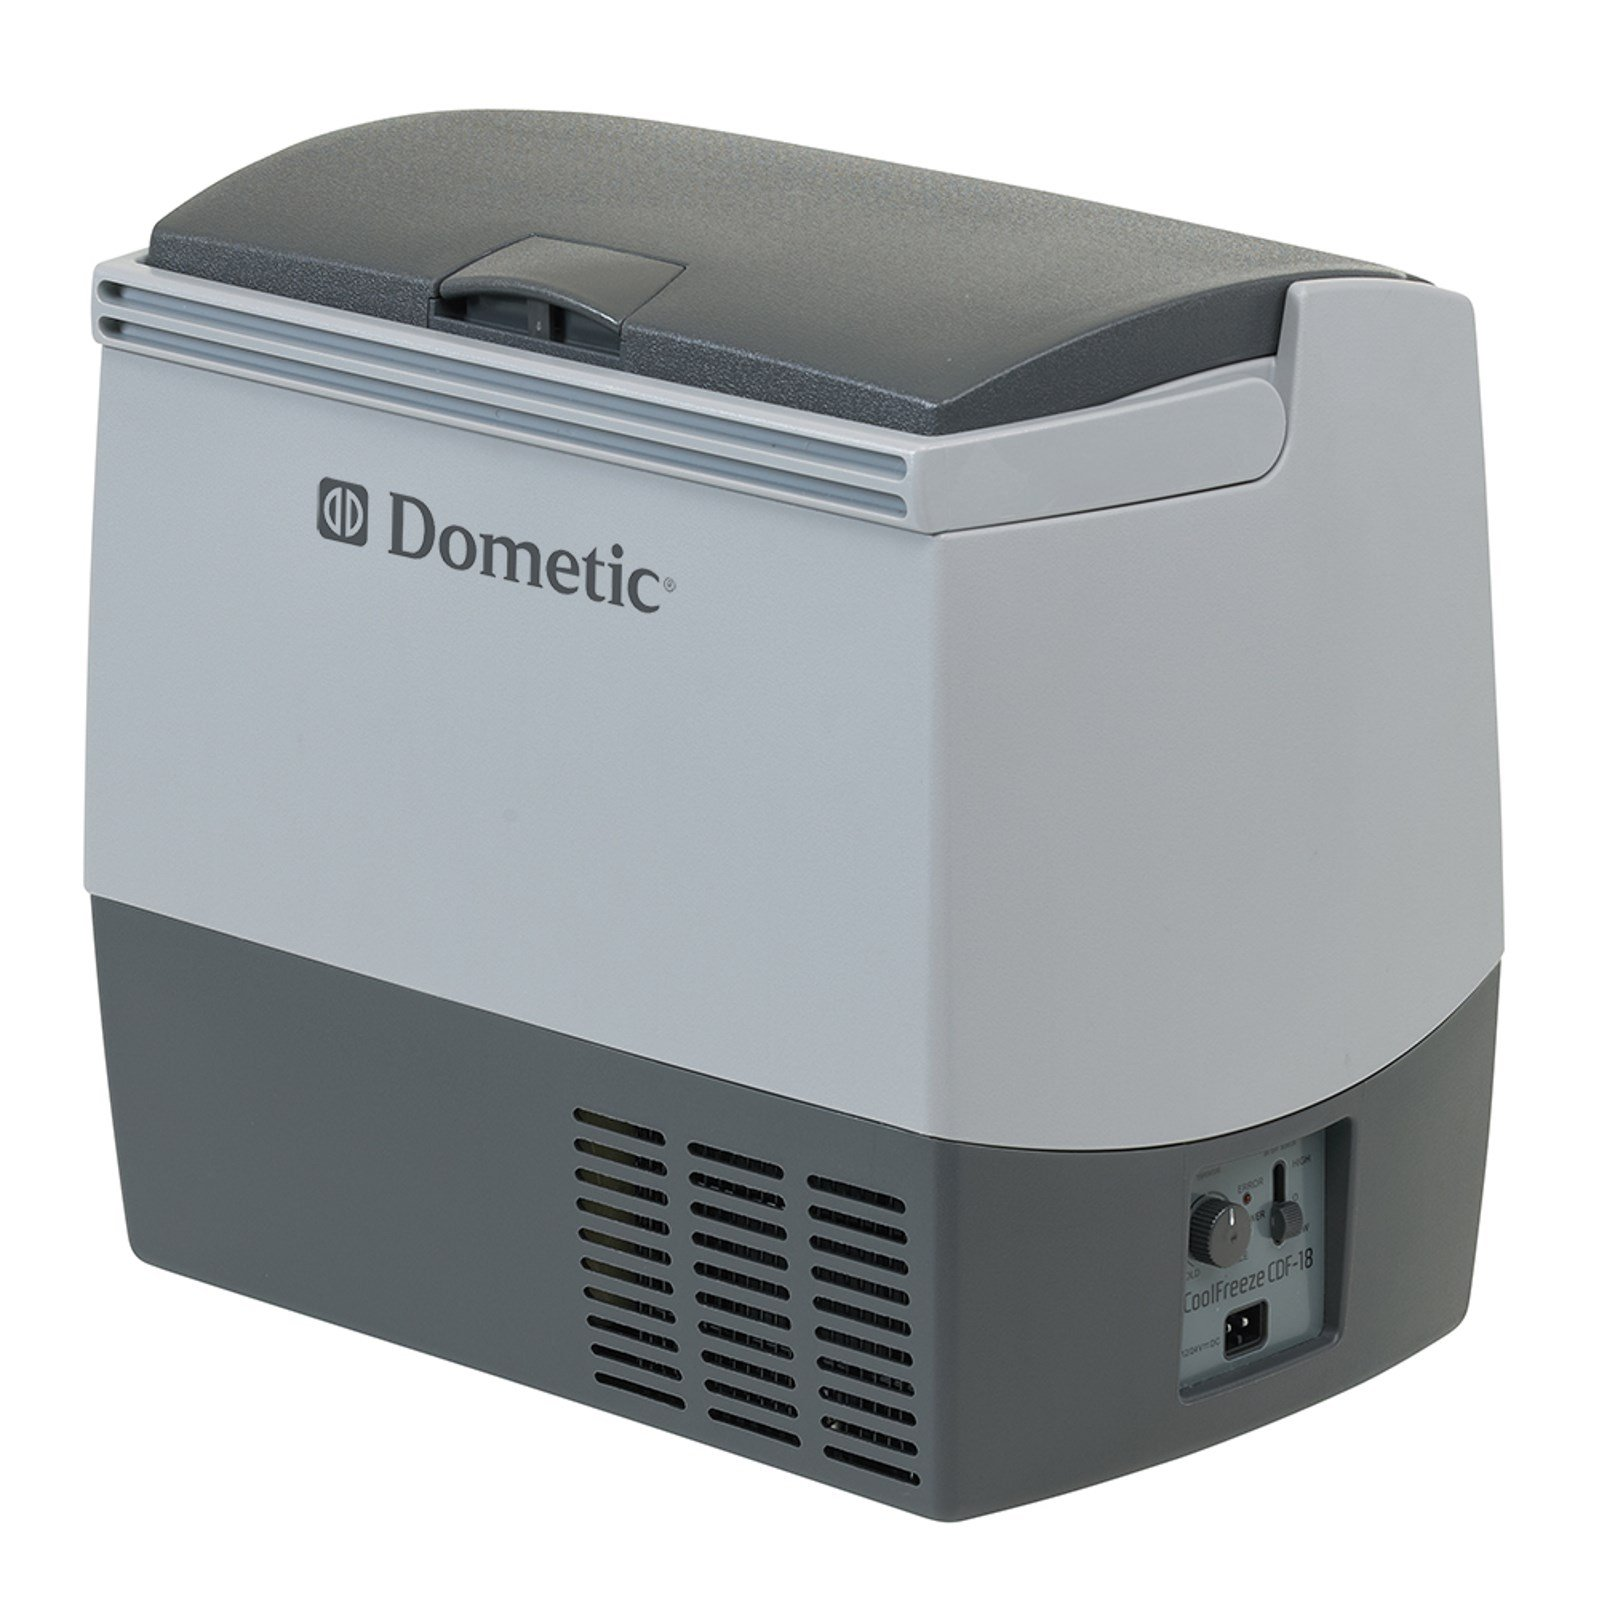 Dometic CF-018-D65-B Portable Freezer/Refrigerator Personal Size, Gray